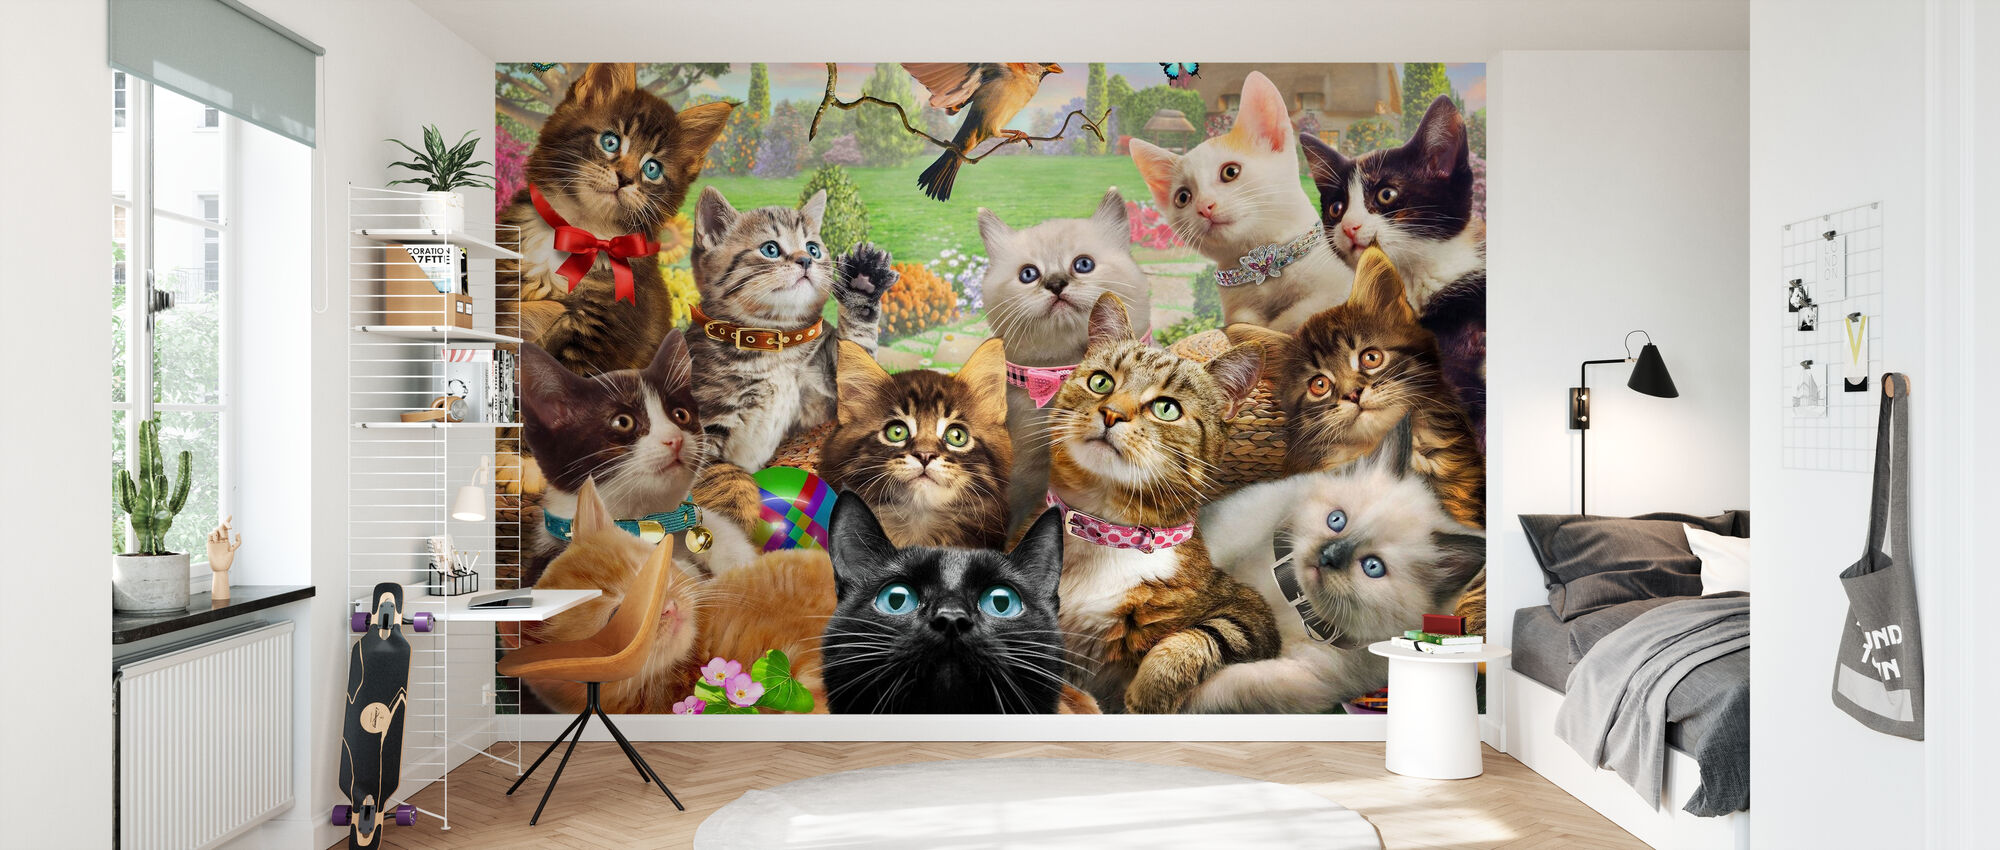 Kittens and bird Europe - Wallpaper - Kids Room